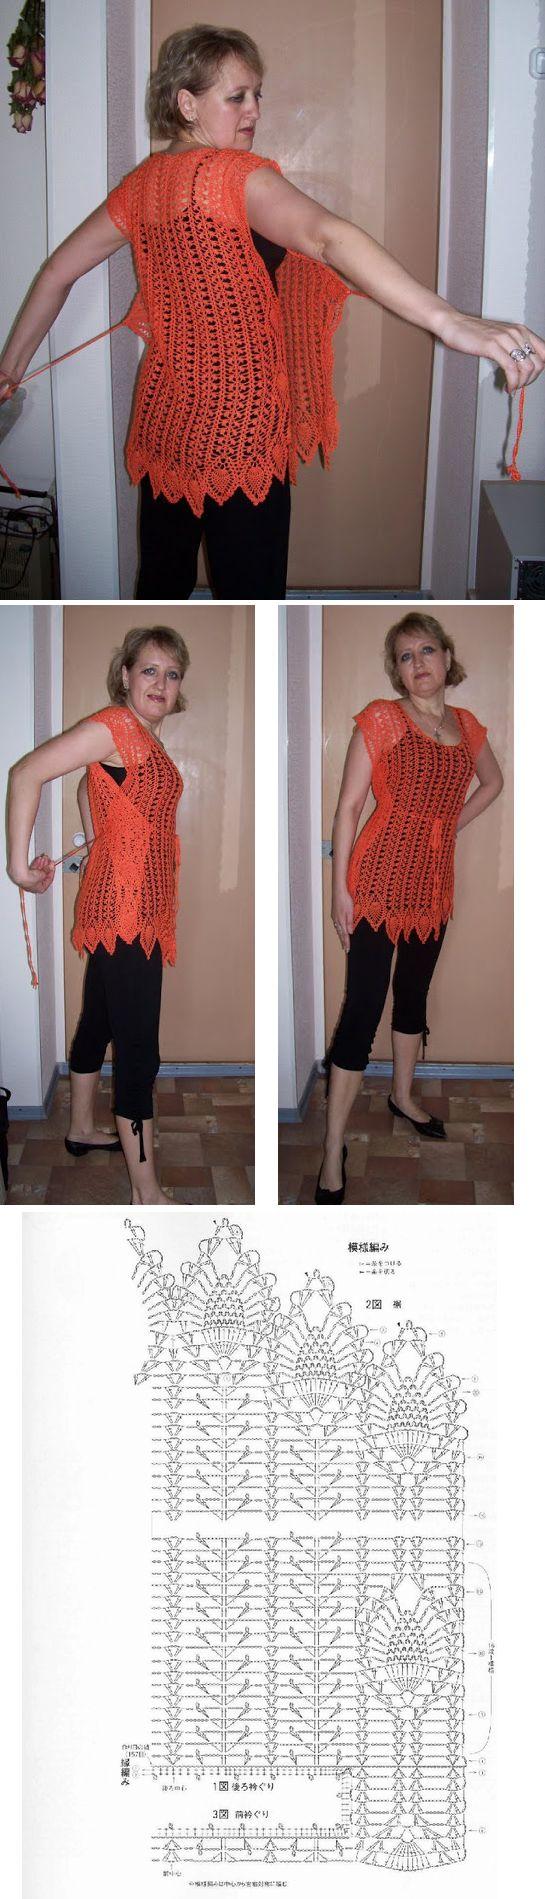 Crochet tunic! - really original!